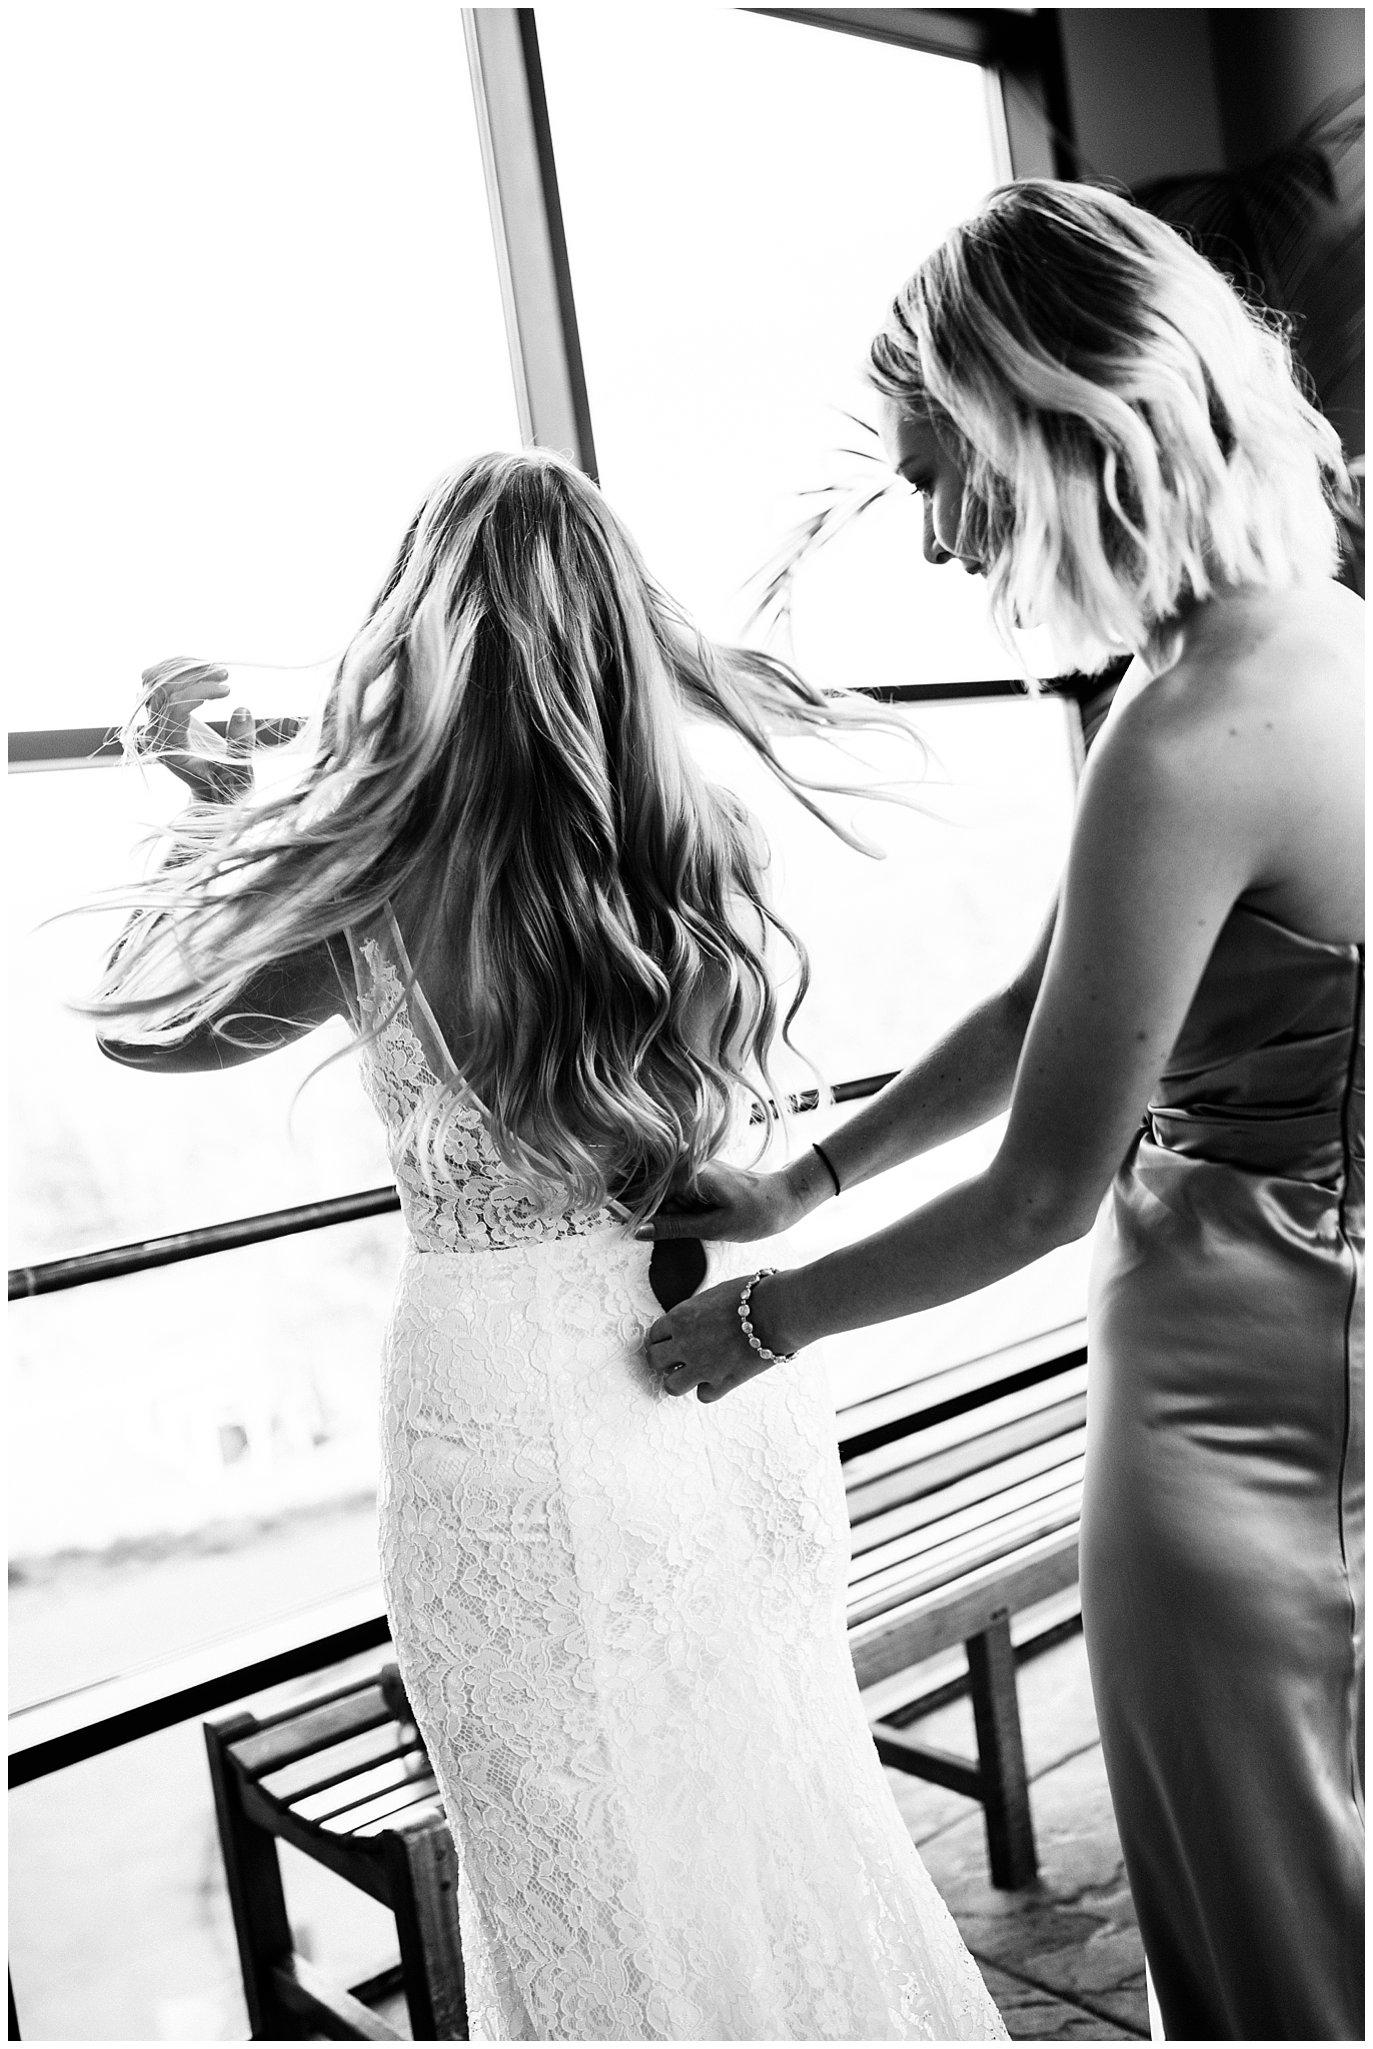 bride zipping lace dress wedding photo